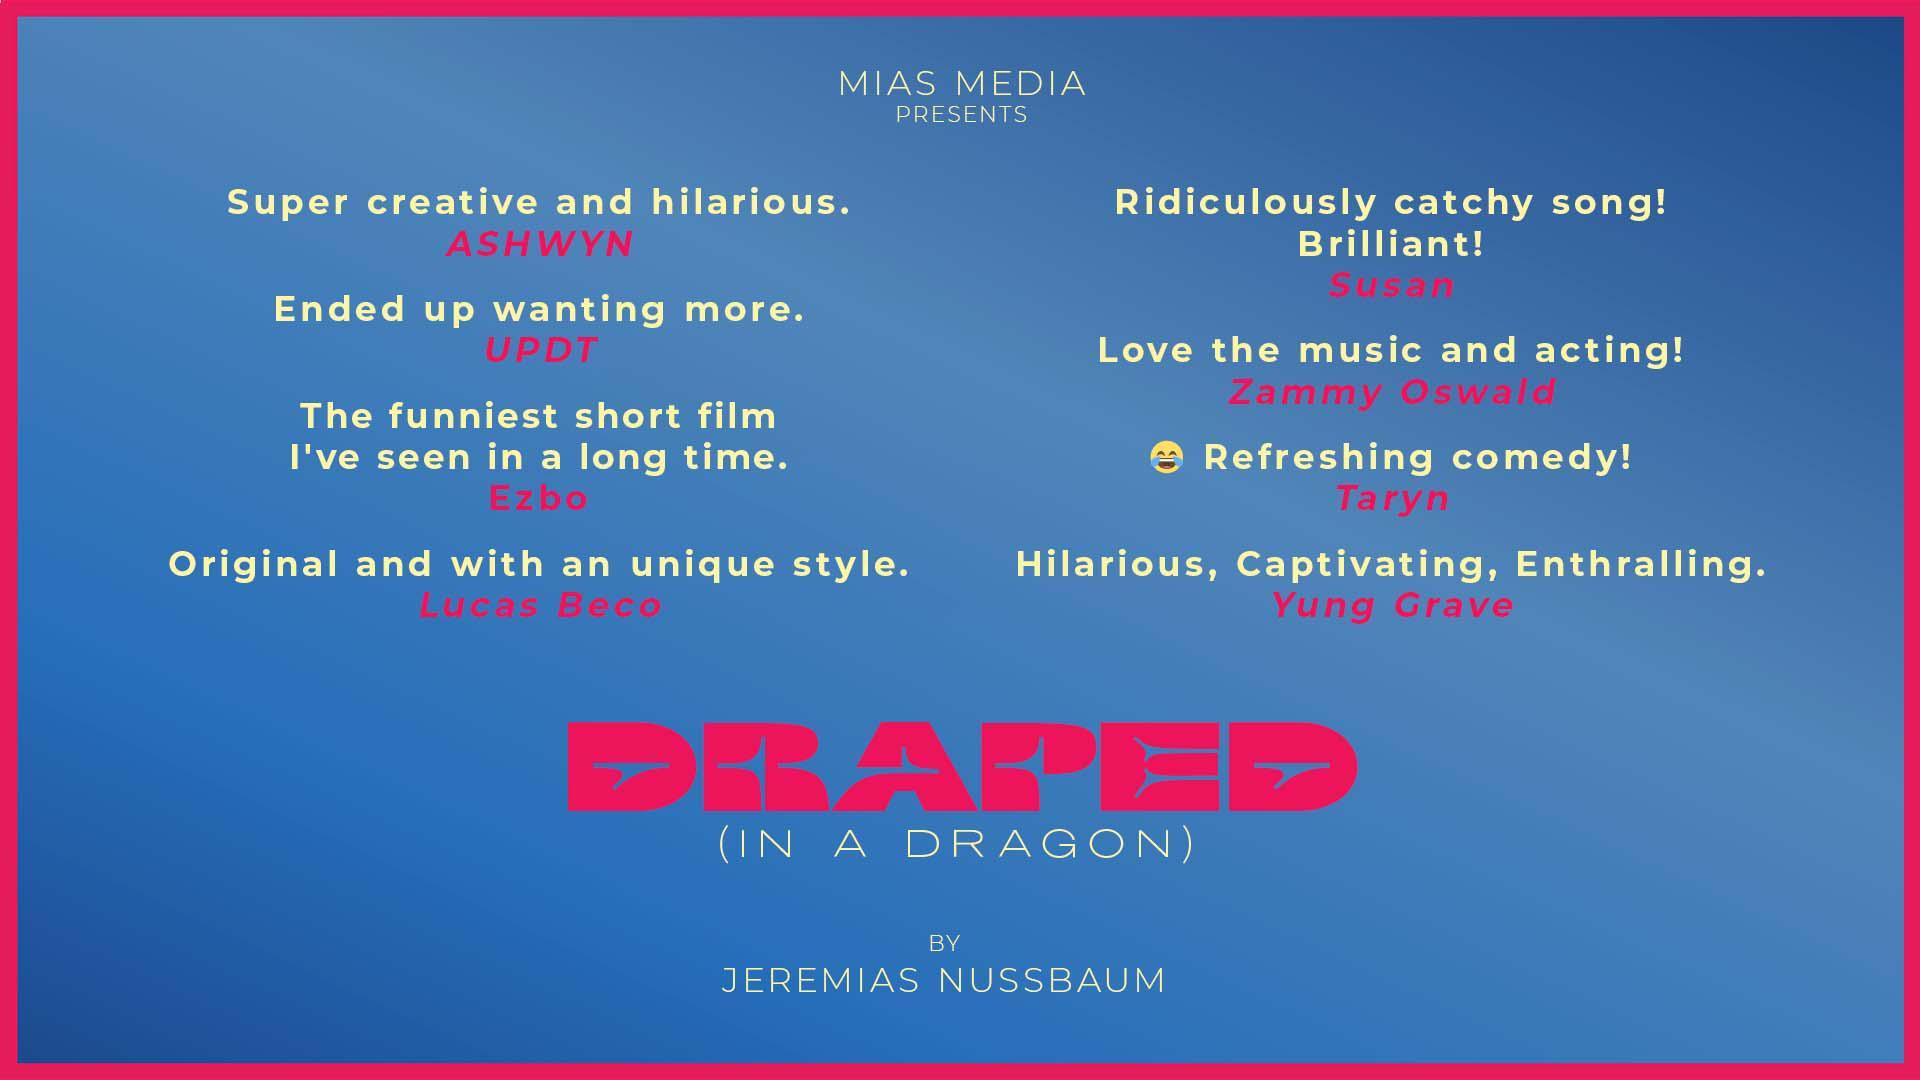 Draped In A Dragon